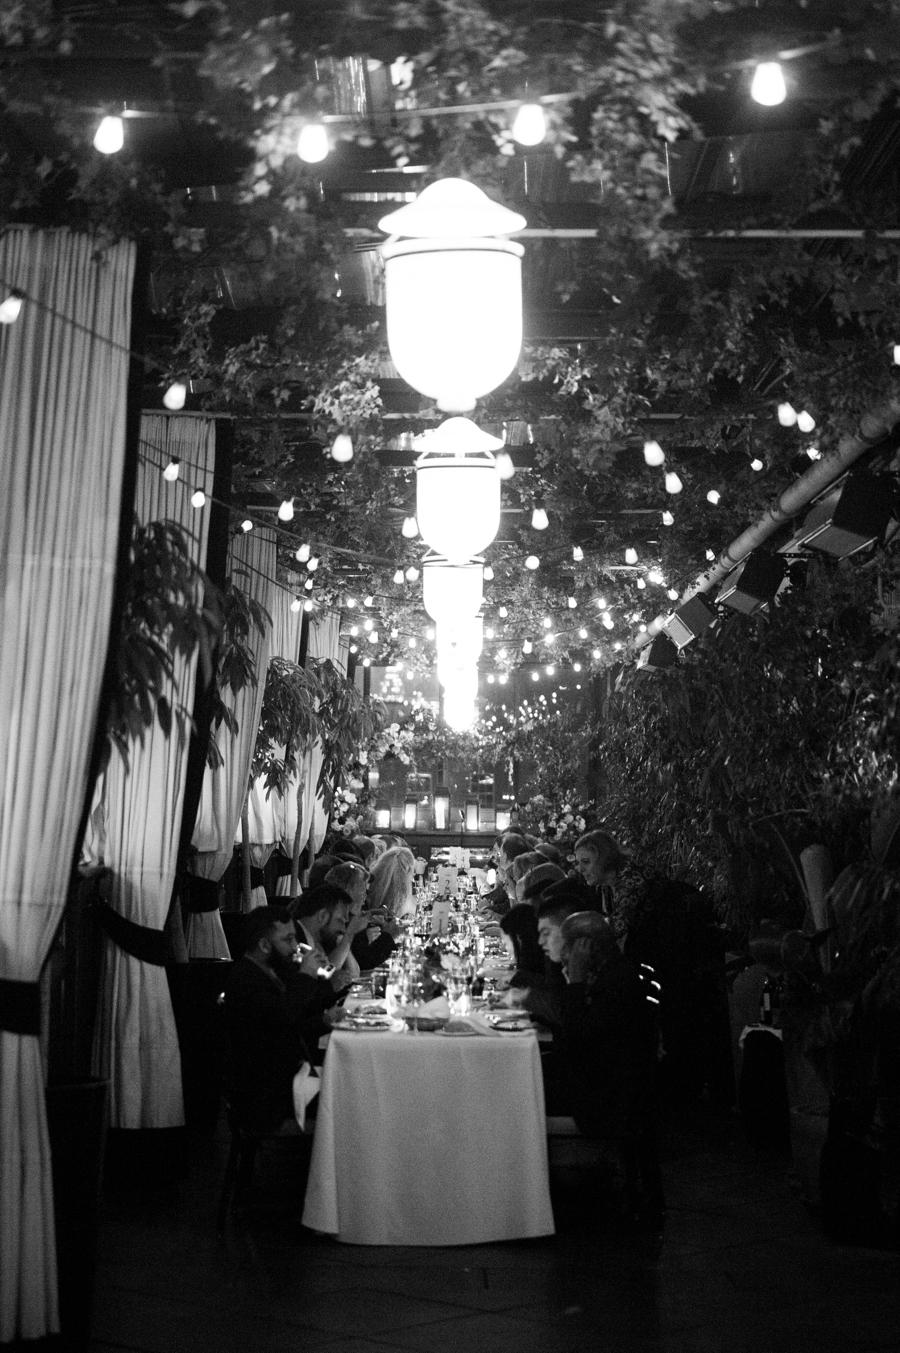 Gramercy_Park_Hotel_NYC_Wedding_AK_035.jpg